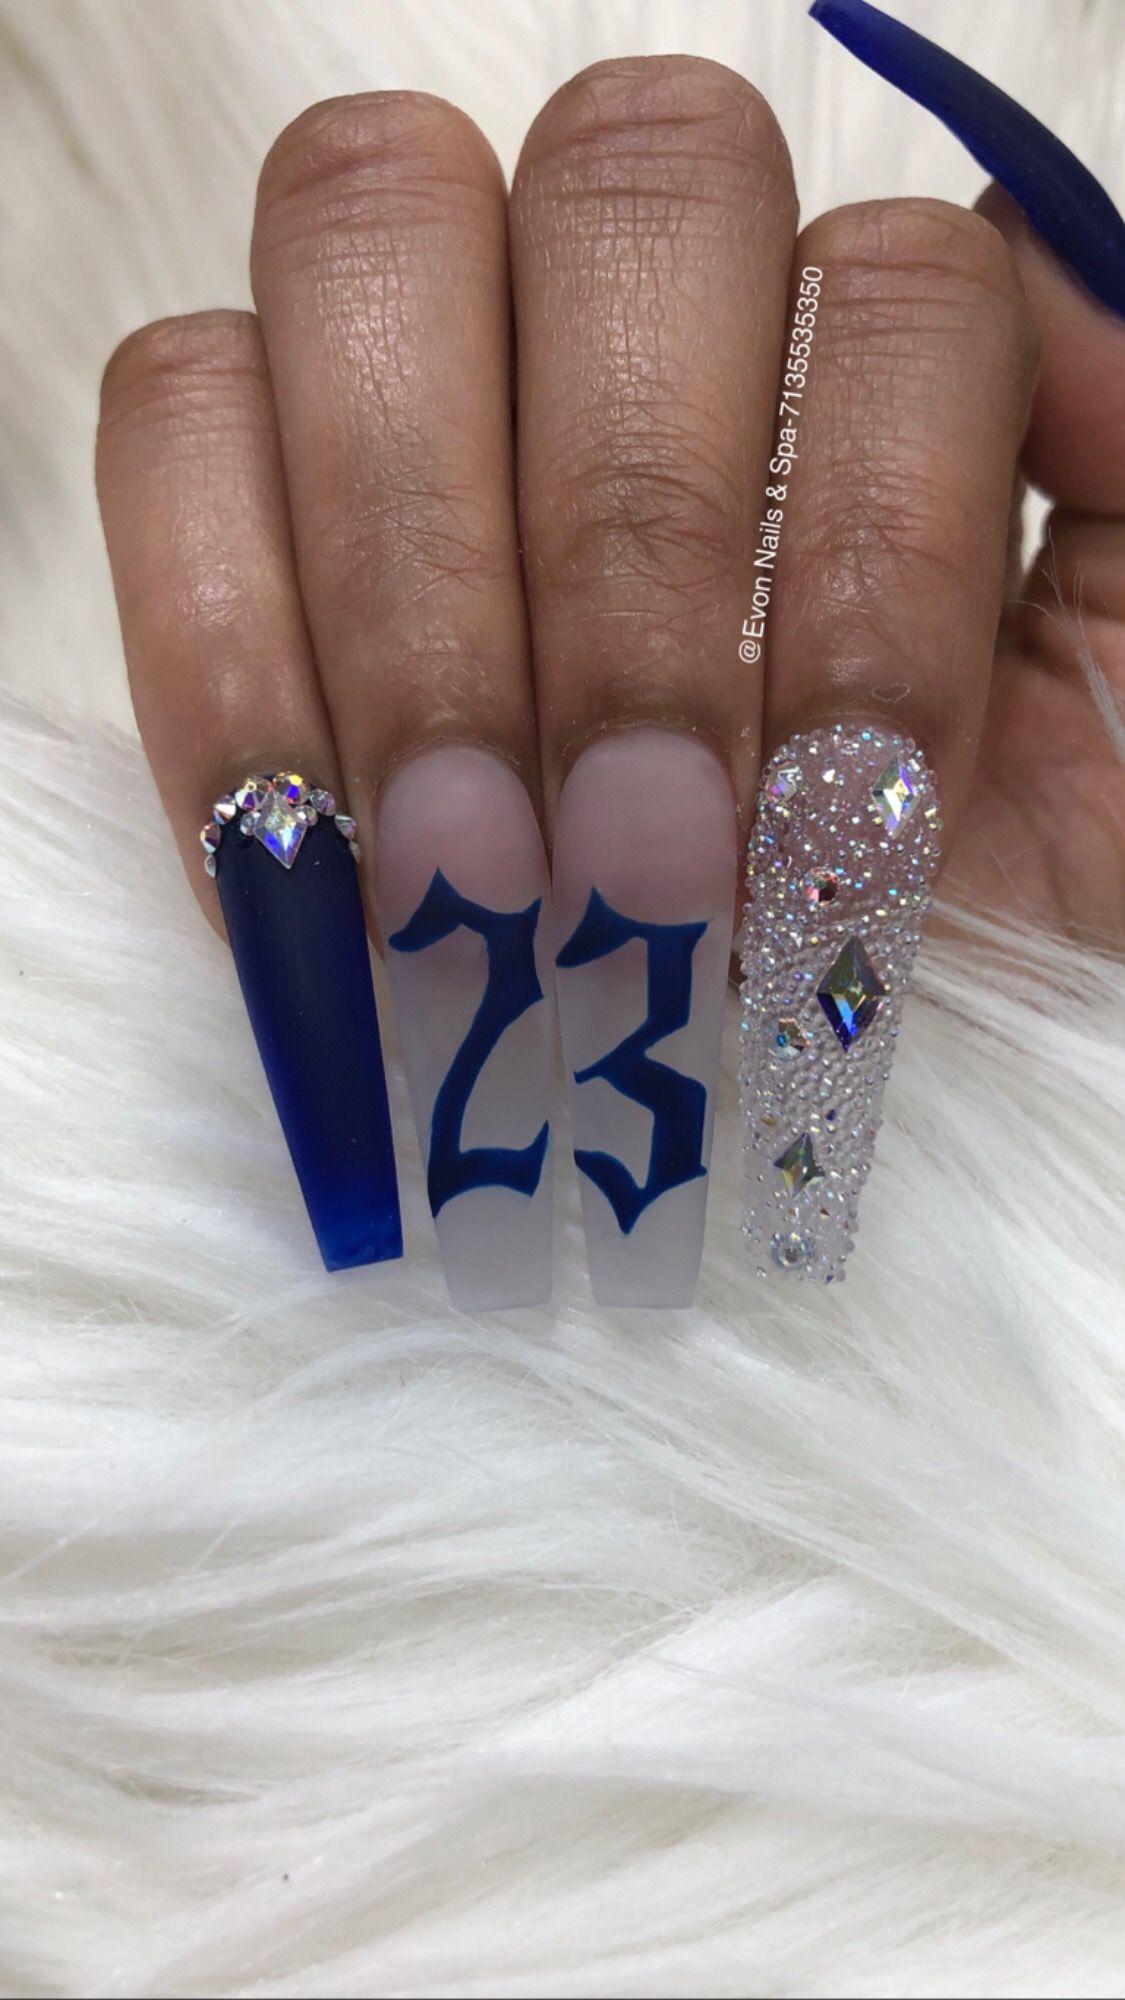 Pin By Evon Nails Spa On Evon Nails Spa Stylish Nails